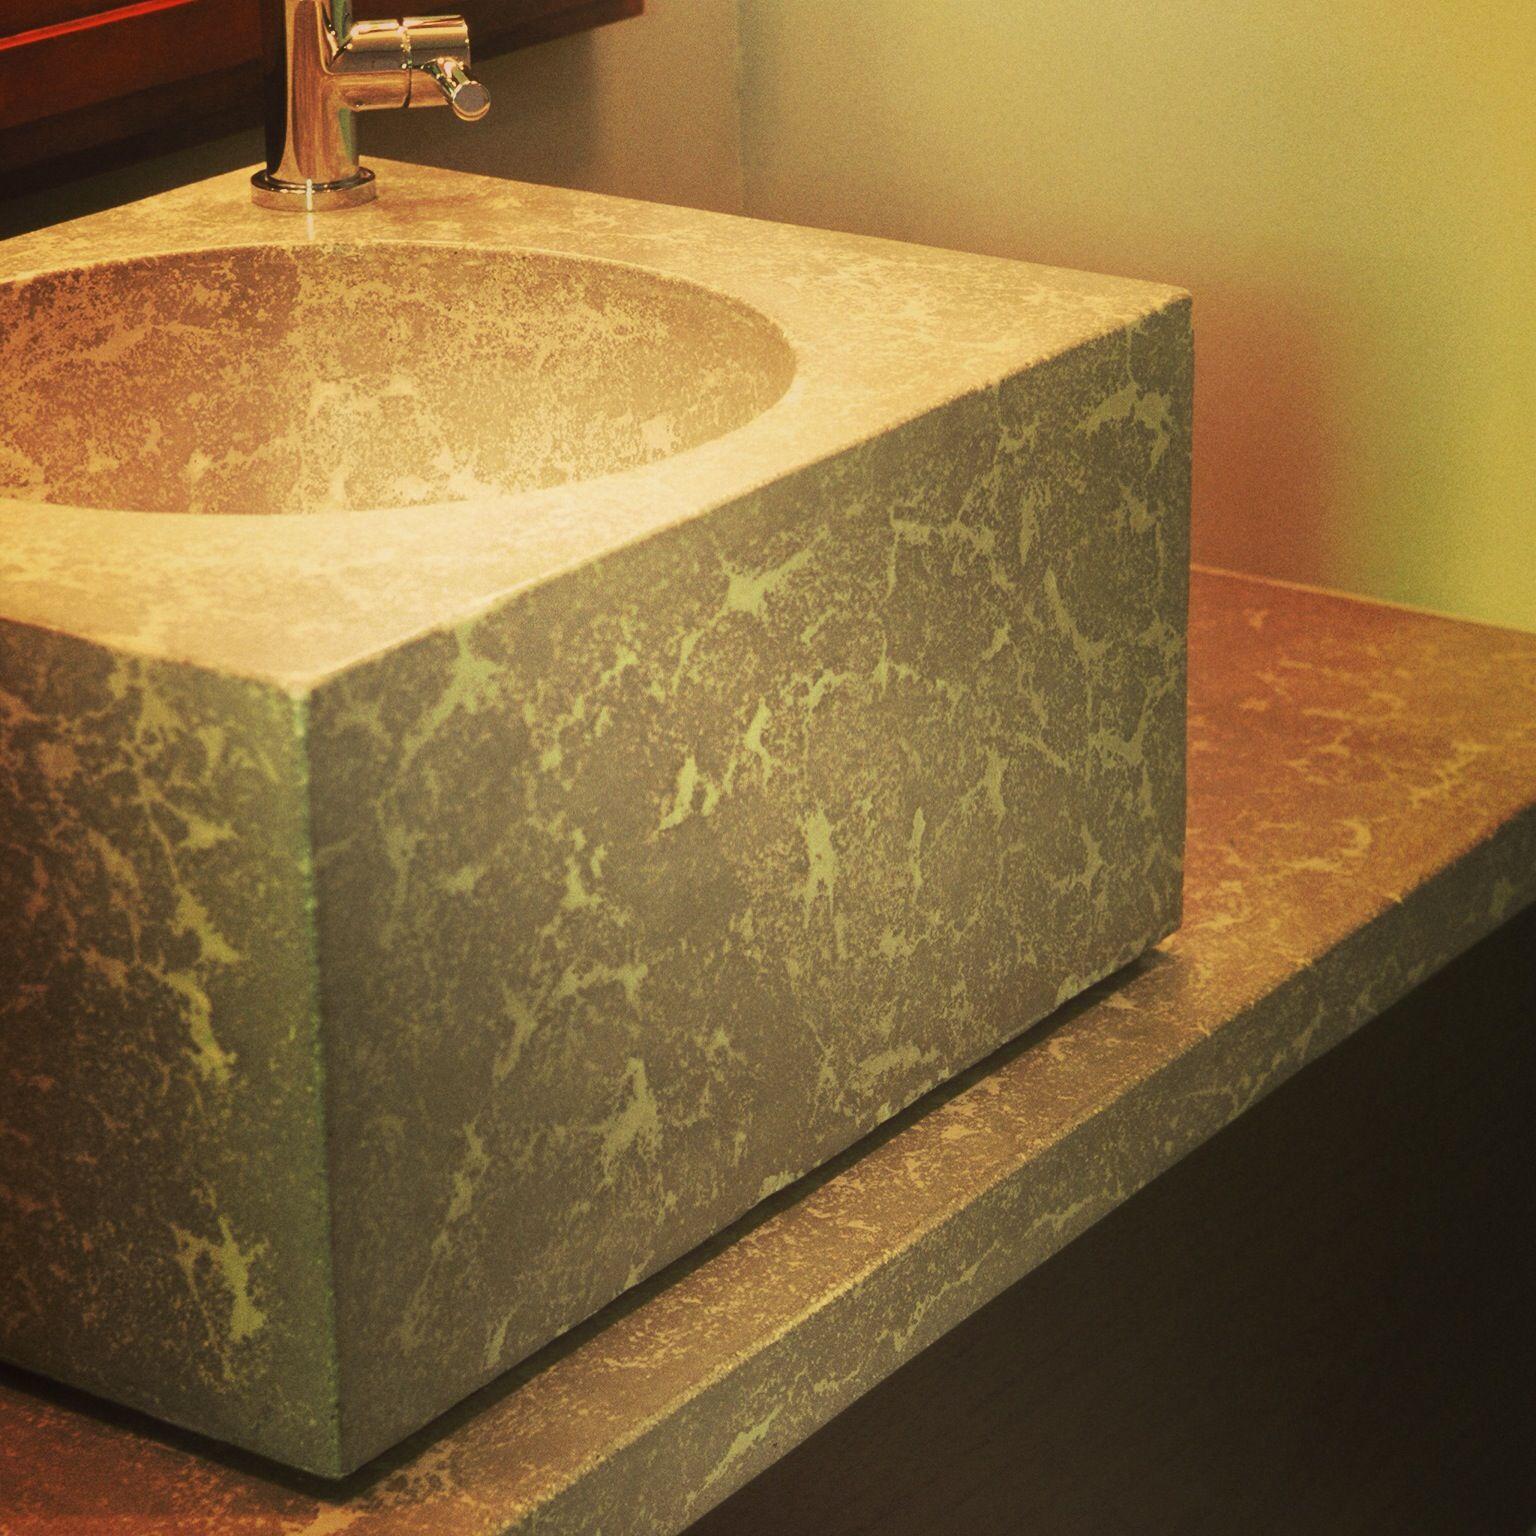 Concrete Bathtub Surround   Buddy Rhodes Studio | Bathroom | Pinterest |  Concrete Bathtub, Bathtub Surround And Bathtubs